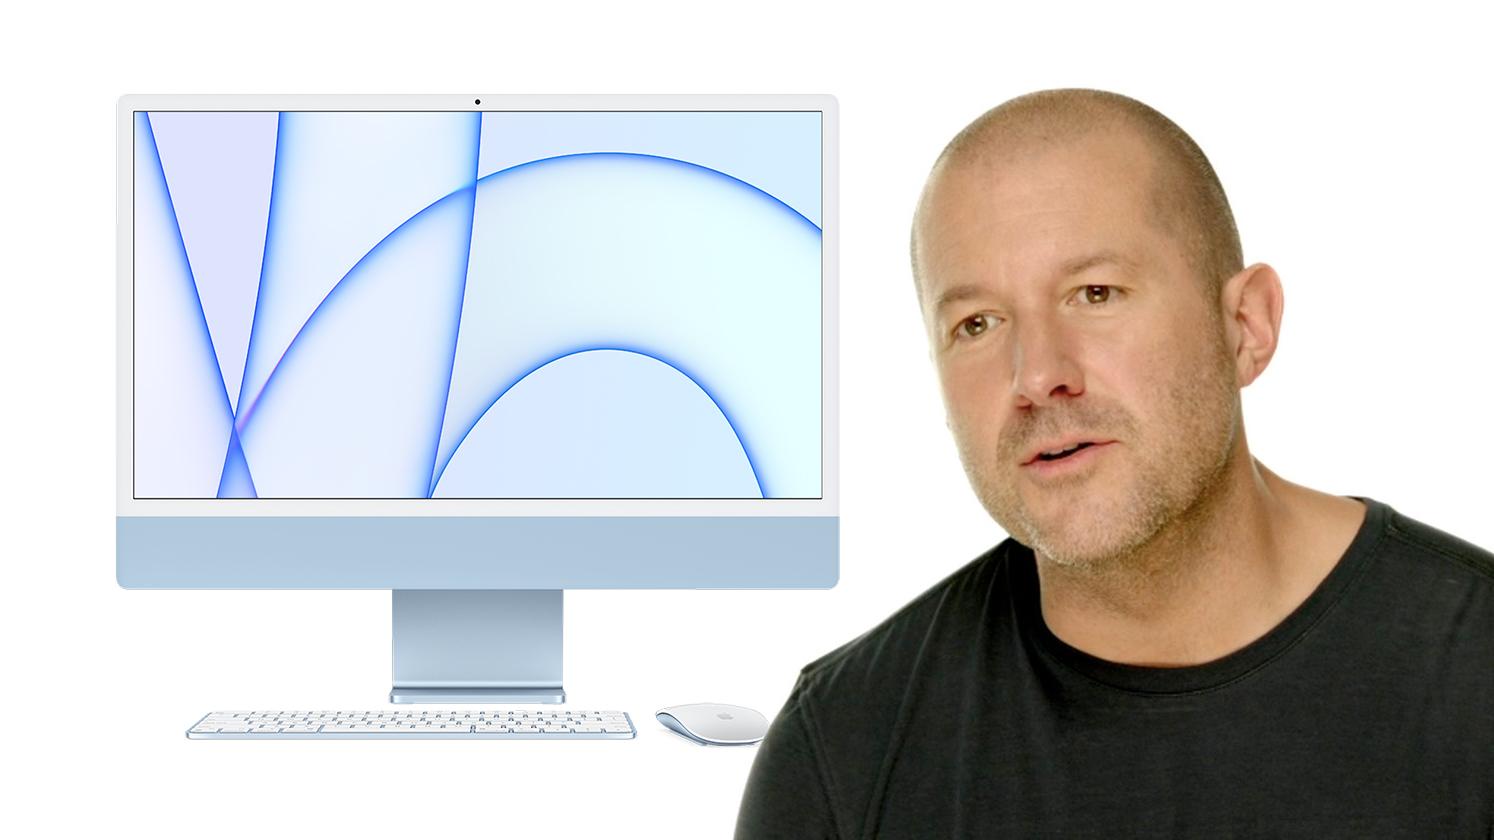 Jony Ive Was Involved in the New M1 iMac Design, Despite Leaving Apple in 2019